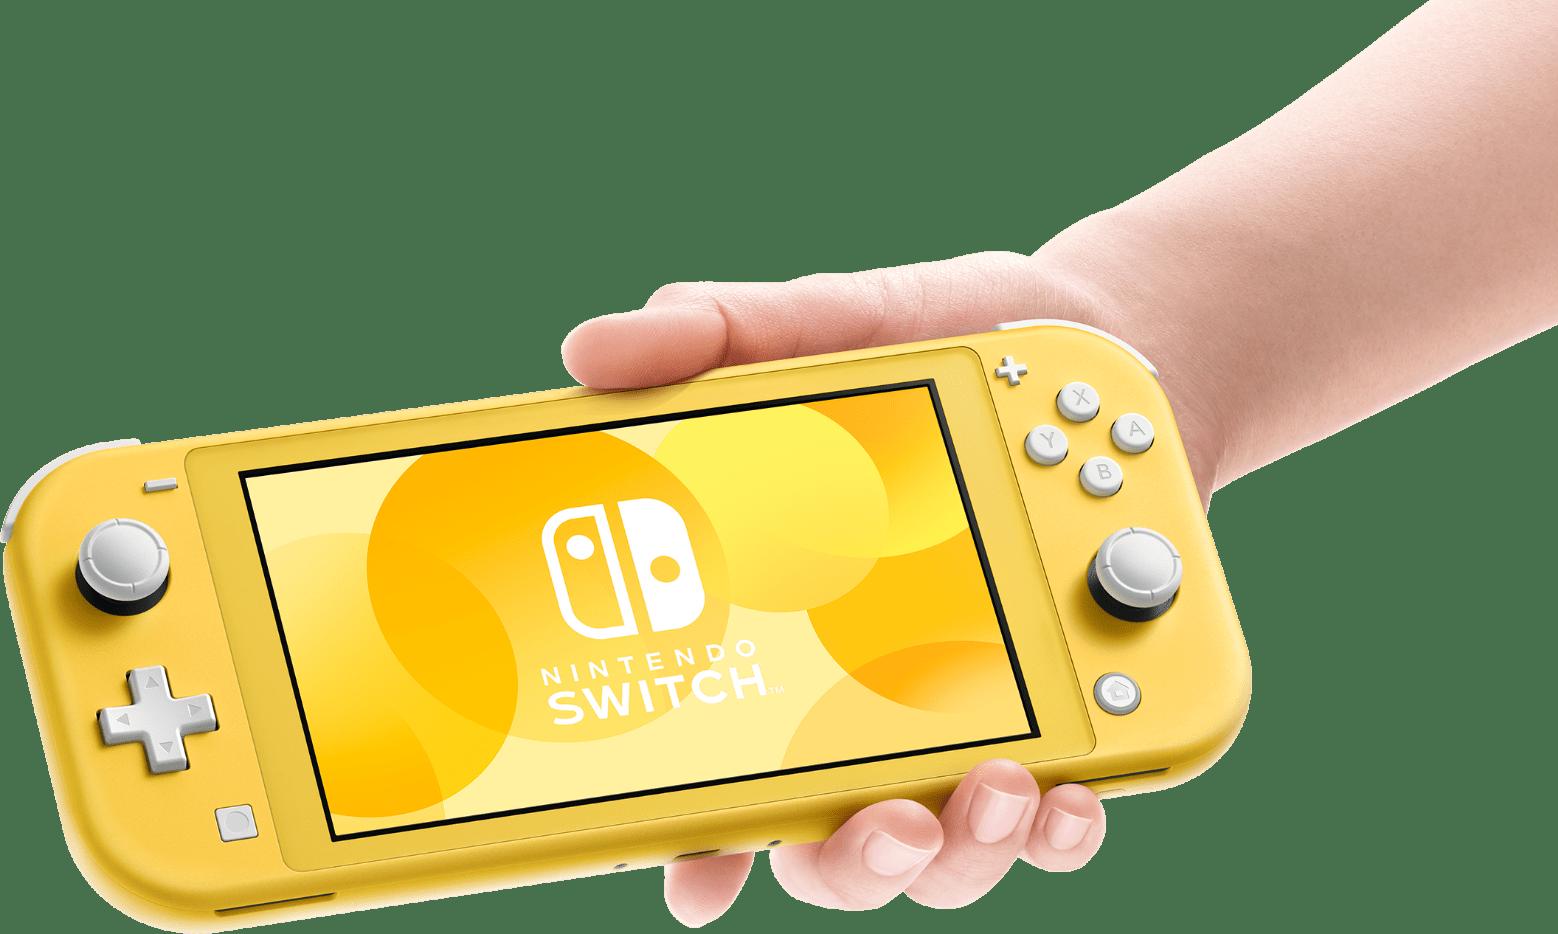 En hand hållandes Switch Lite